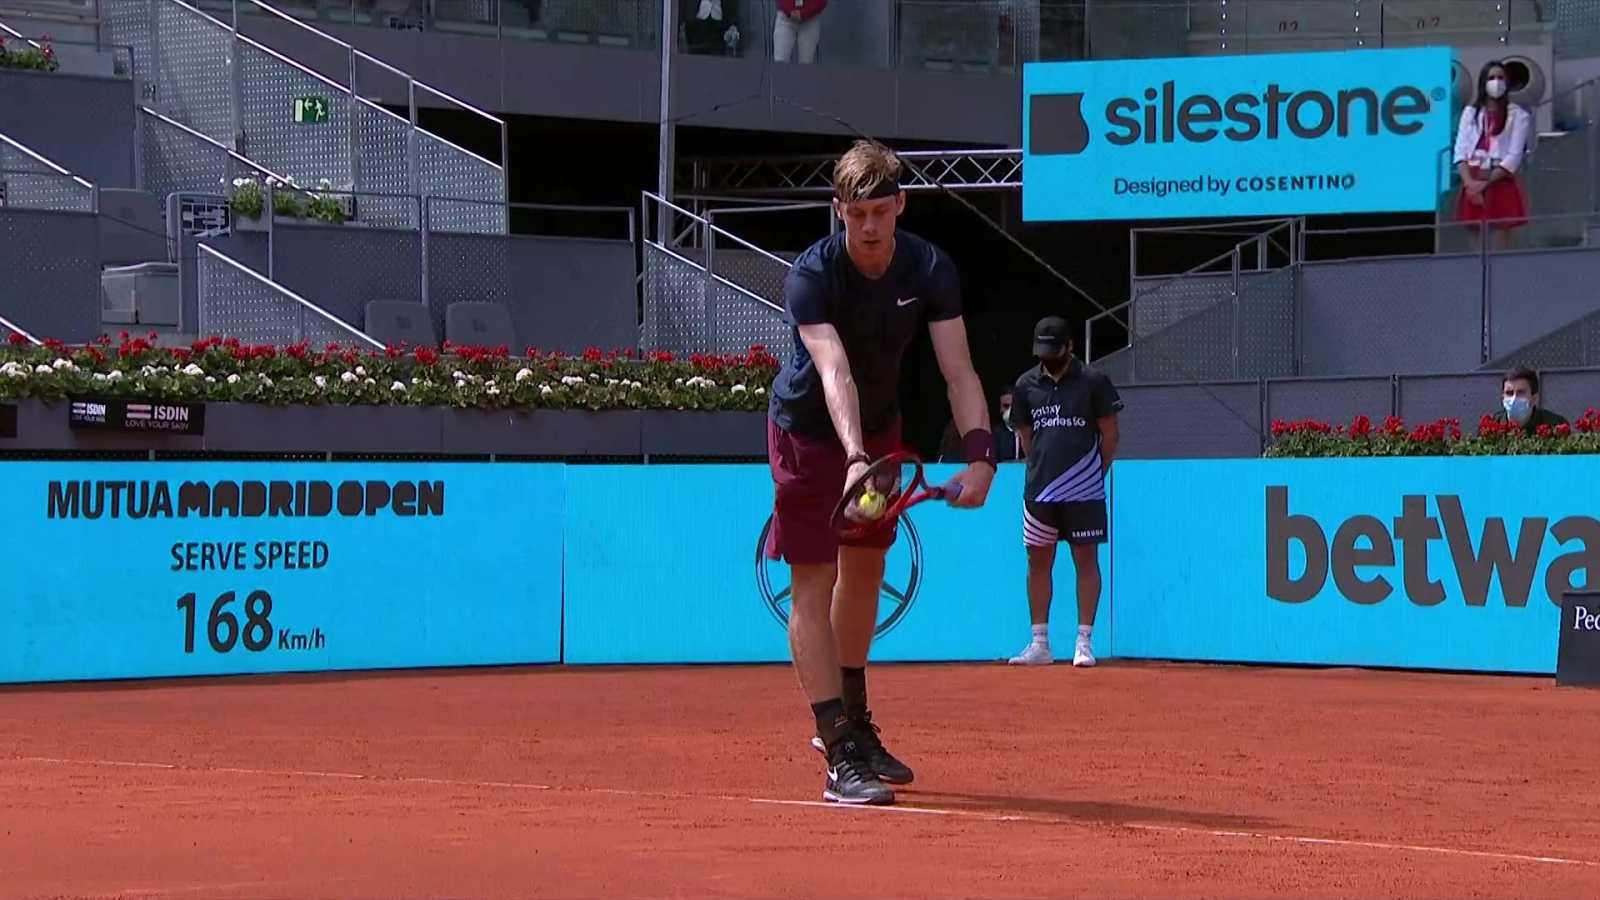 Tenis - ATP/WTA Mutua Madrid Open: Dusan Lajovic - Denis Shapovalov - ver ahora